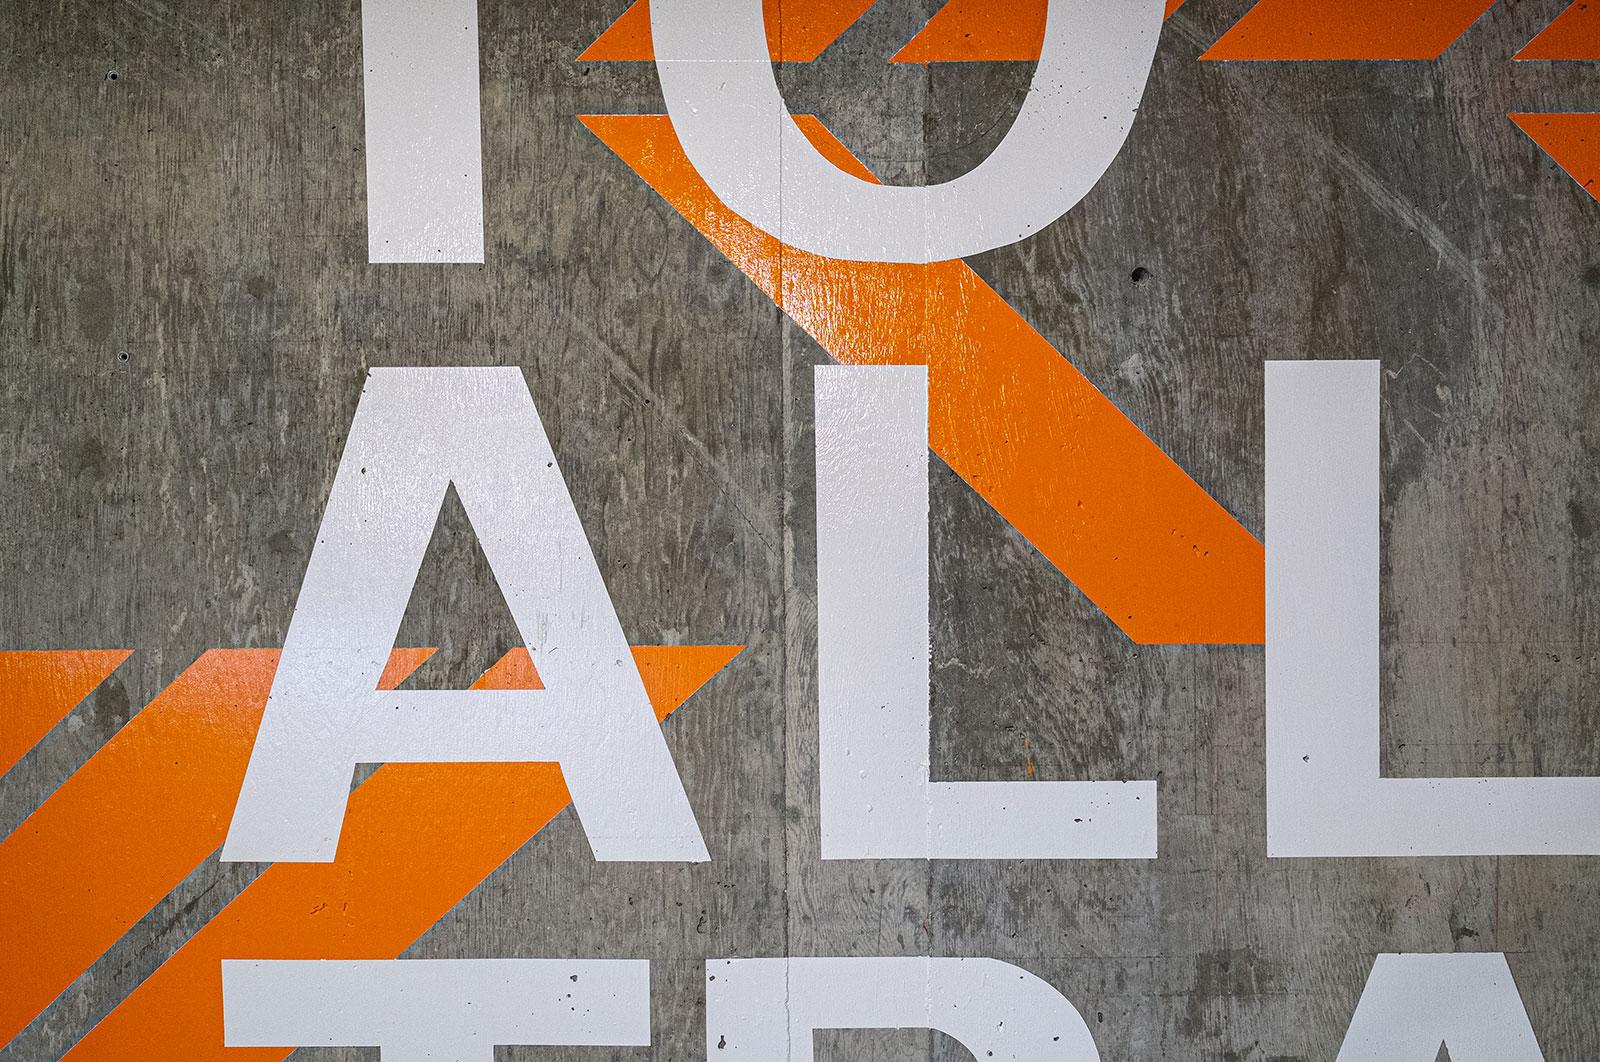 1600_bart-milbrae-signage20200605-55